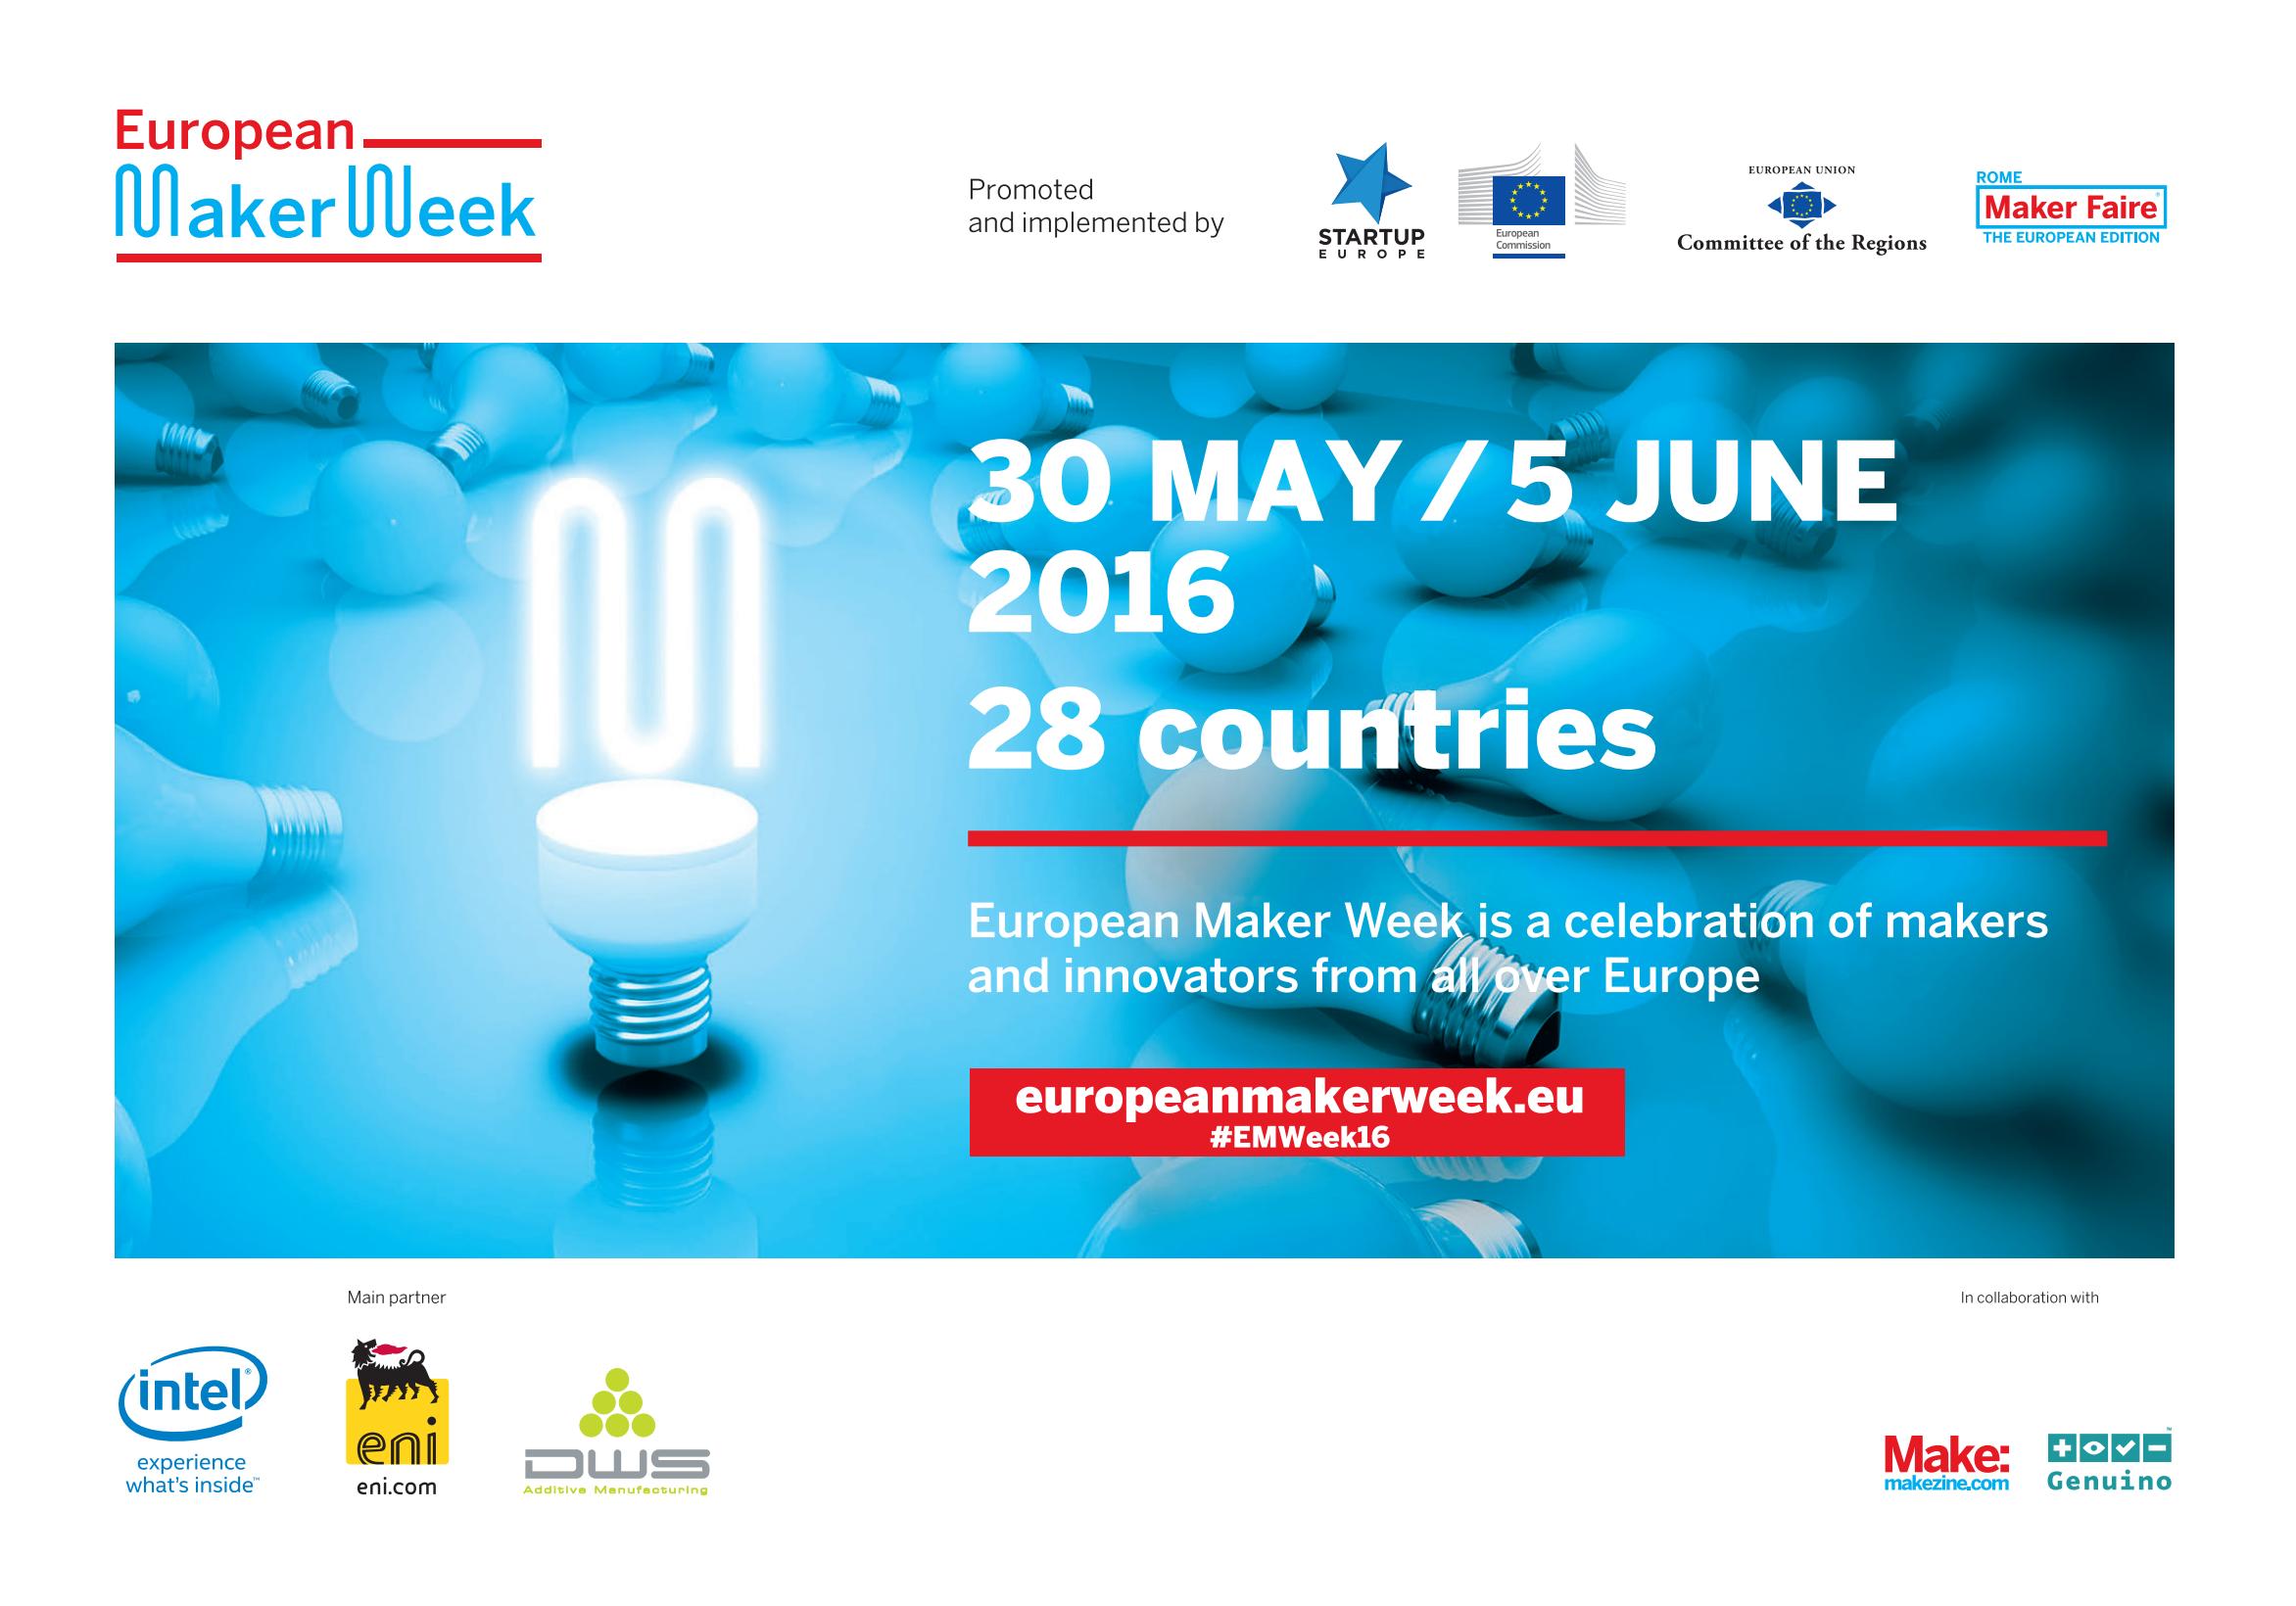 #EMWeek16 European Maker Week: tutti gli eventi organizzati in Italia